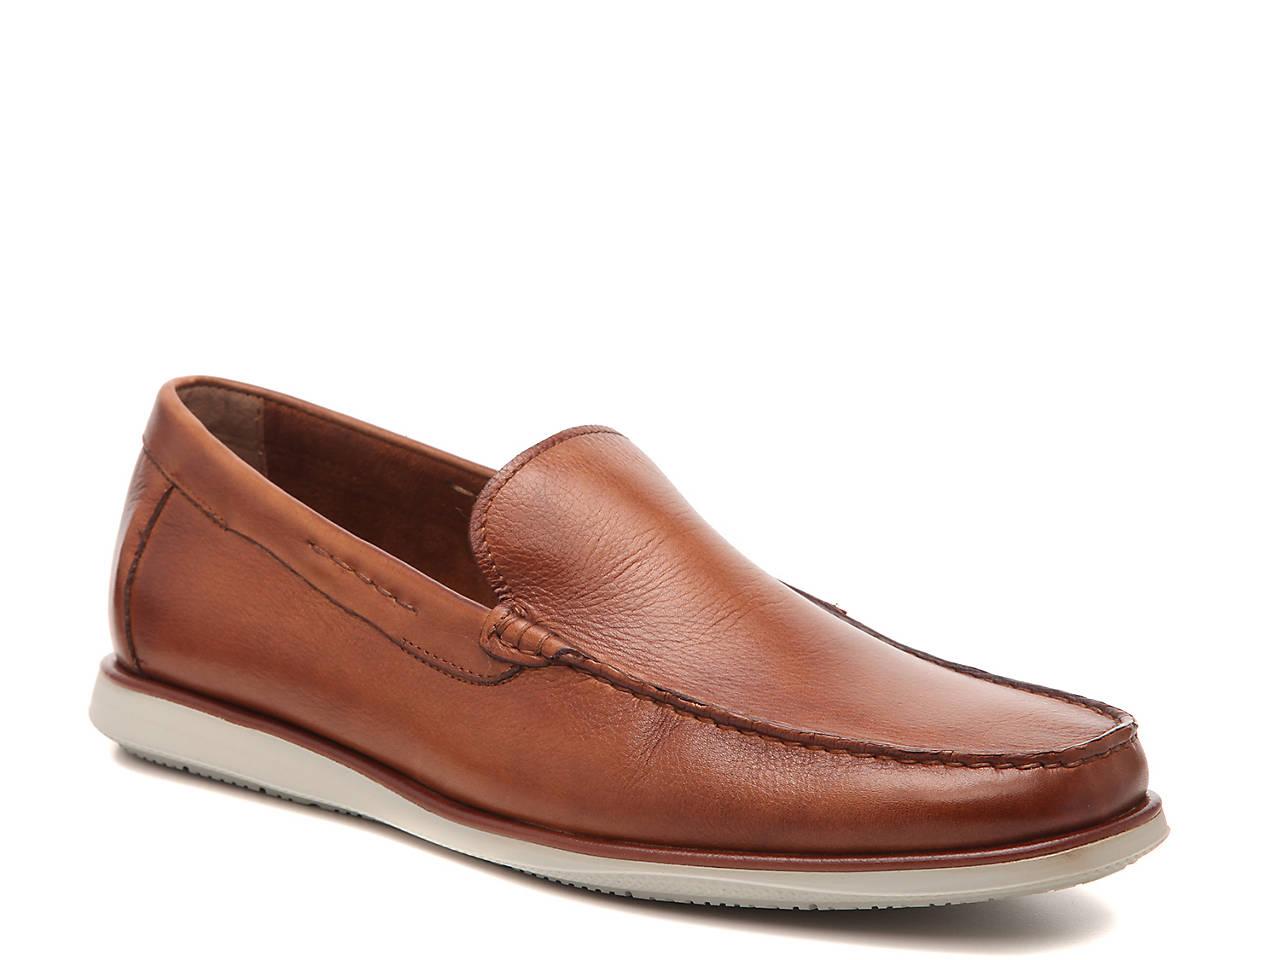 c2450e8a7ca3 Design 213172 Loafer